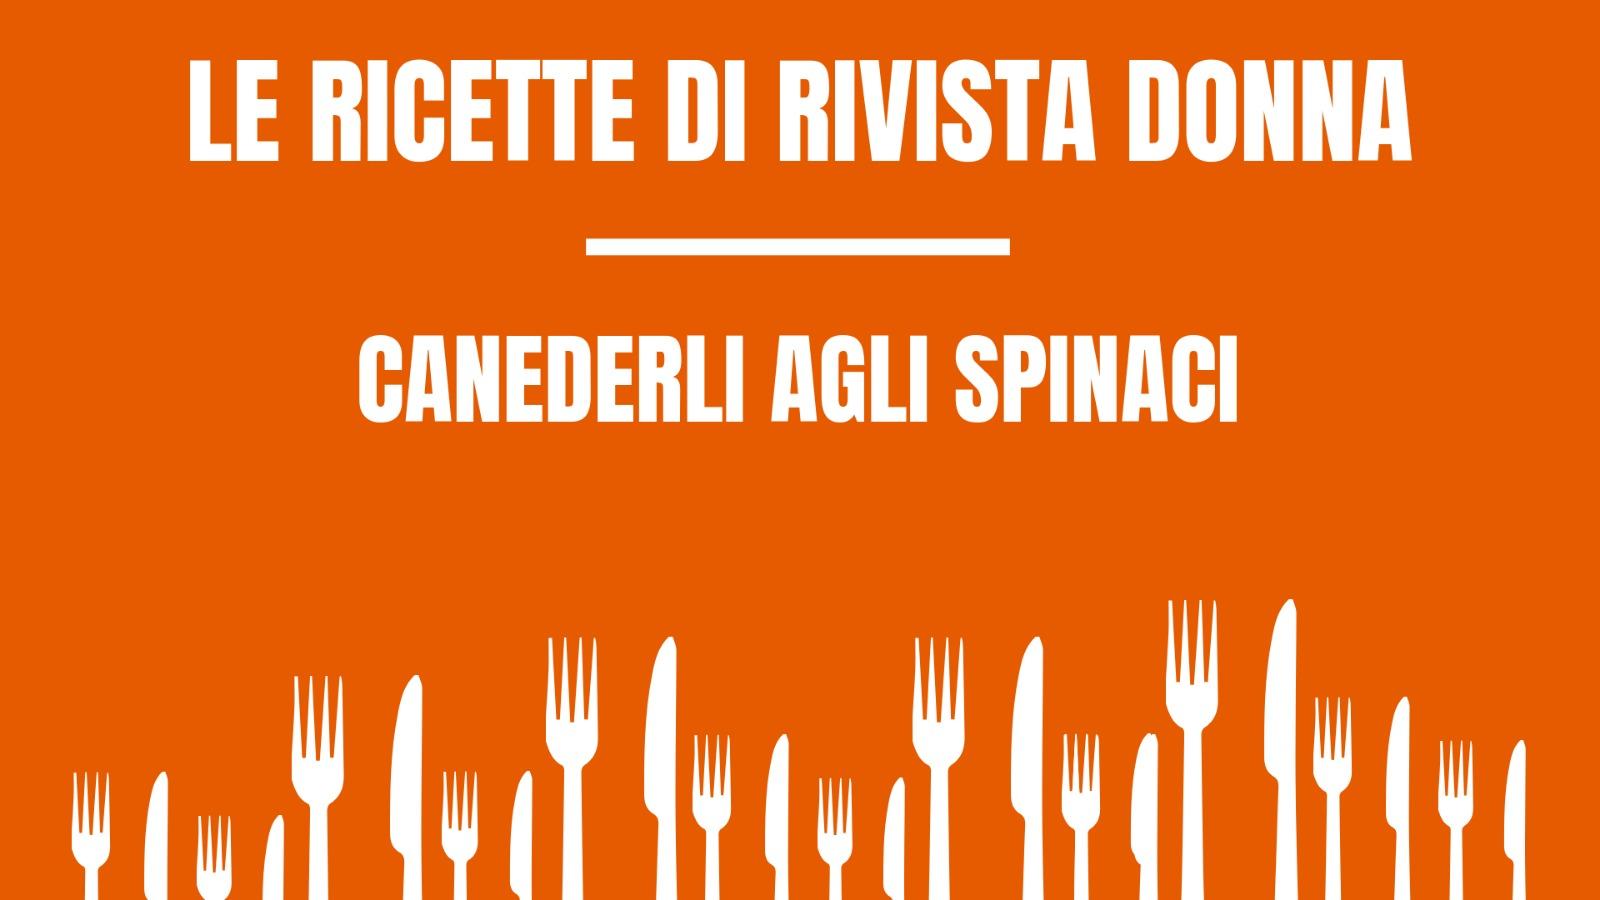 CanederliagliSpinaci-RivistaDonna.com